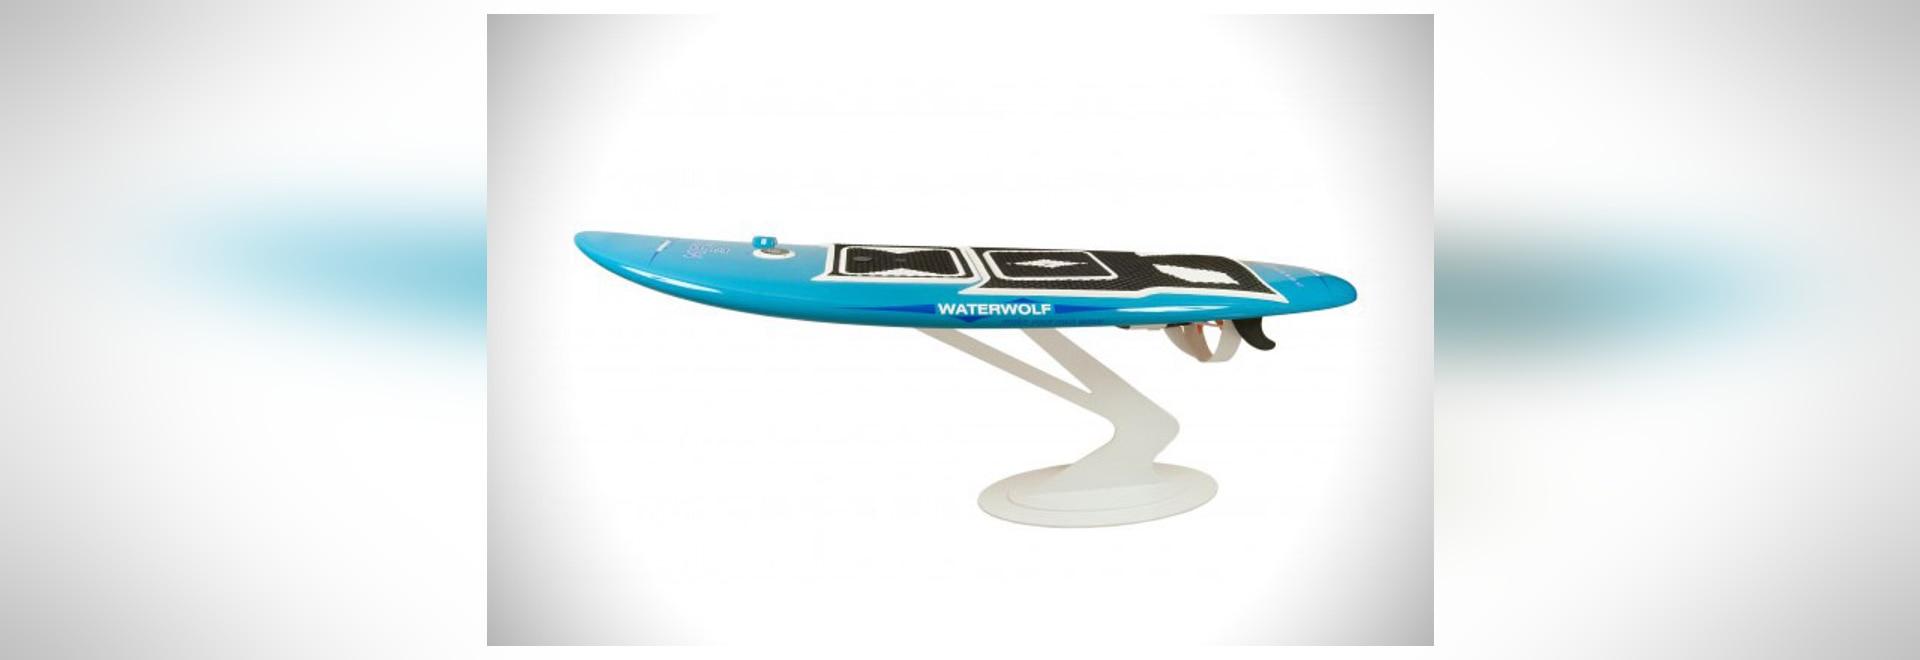 THE WATERWOLF MXP-3 ELECTRIC SURFBOARD